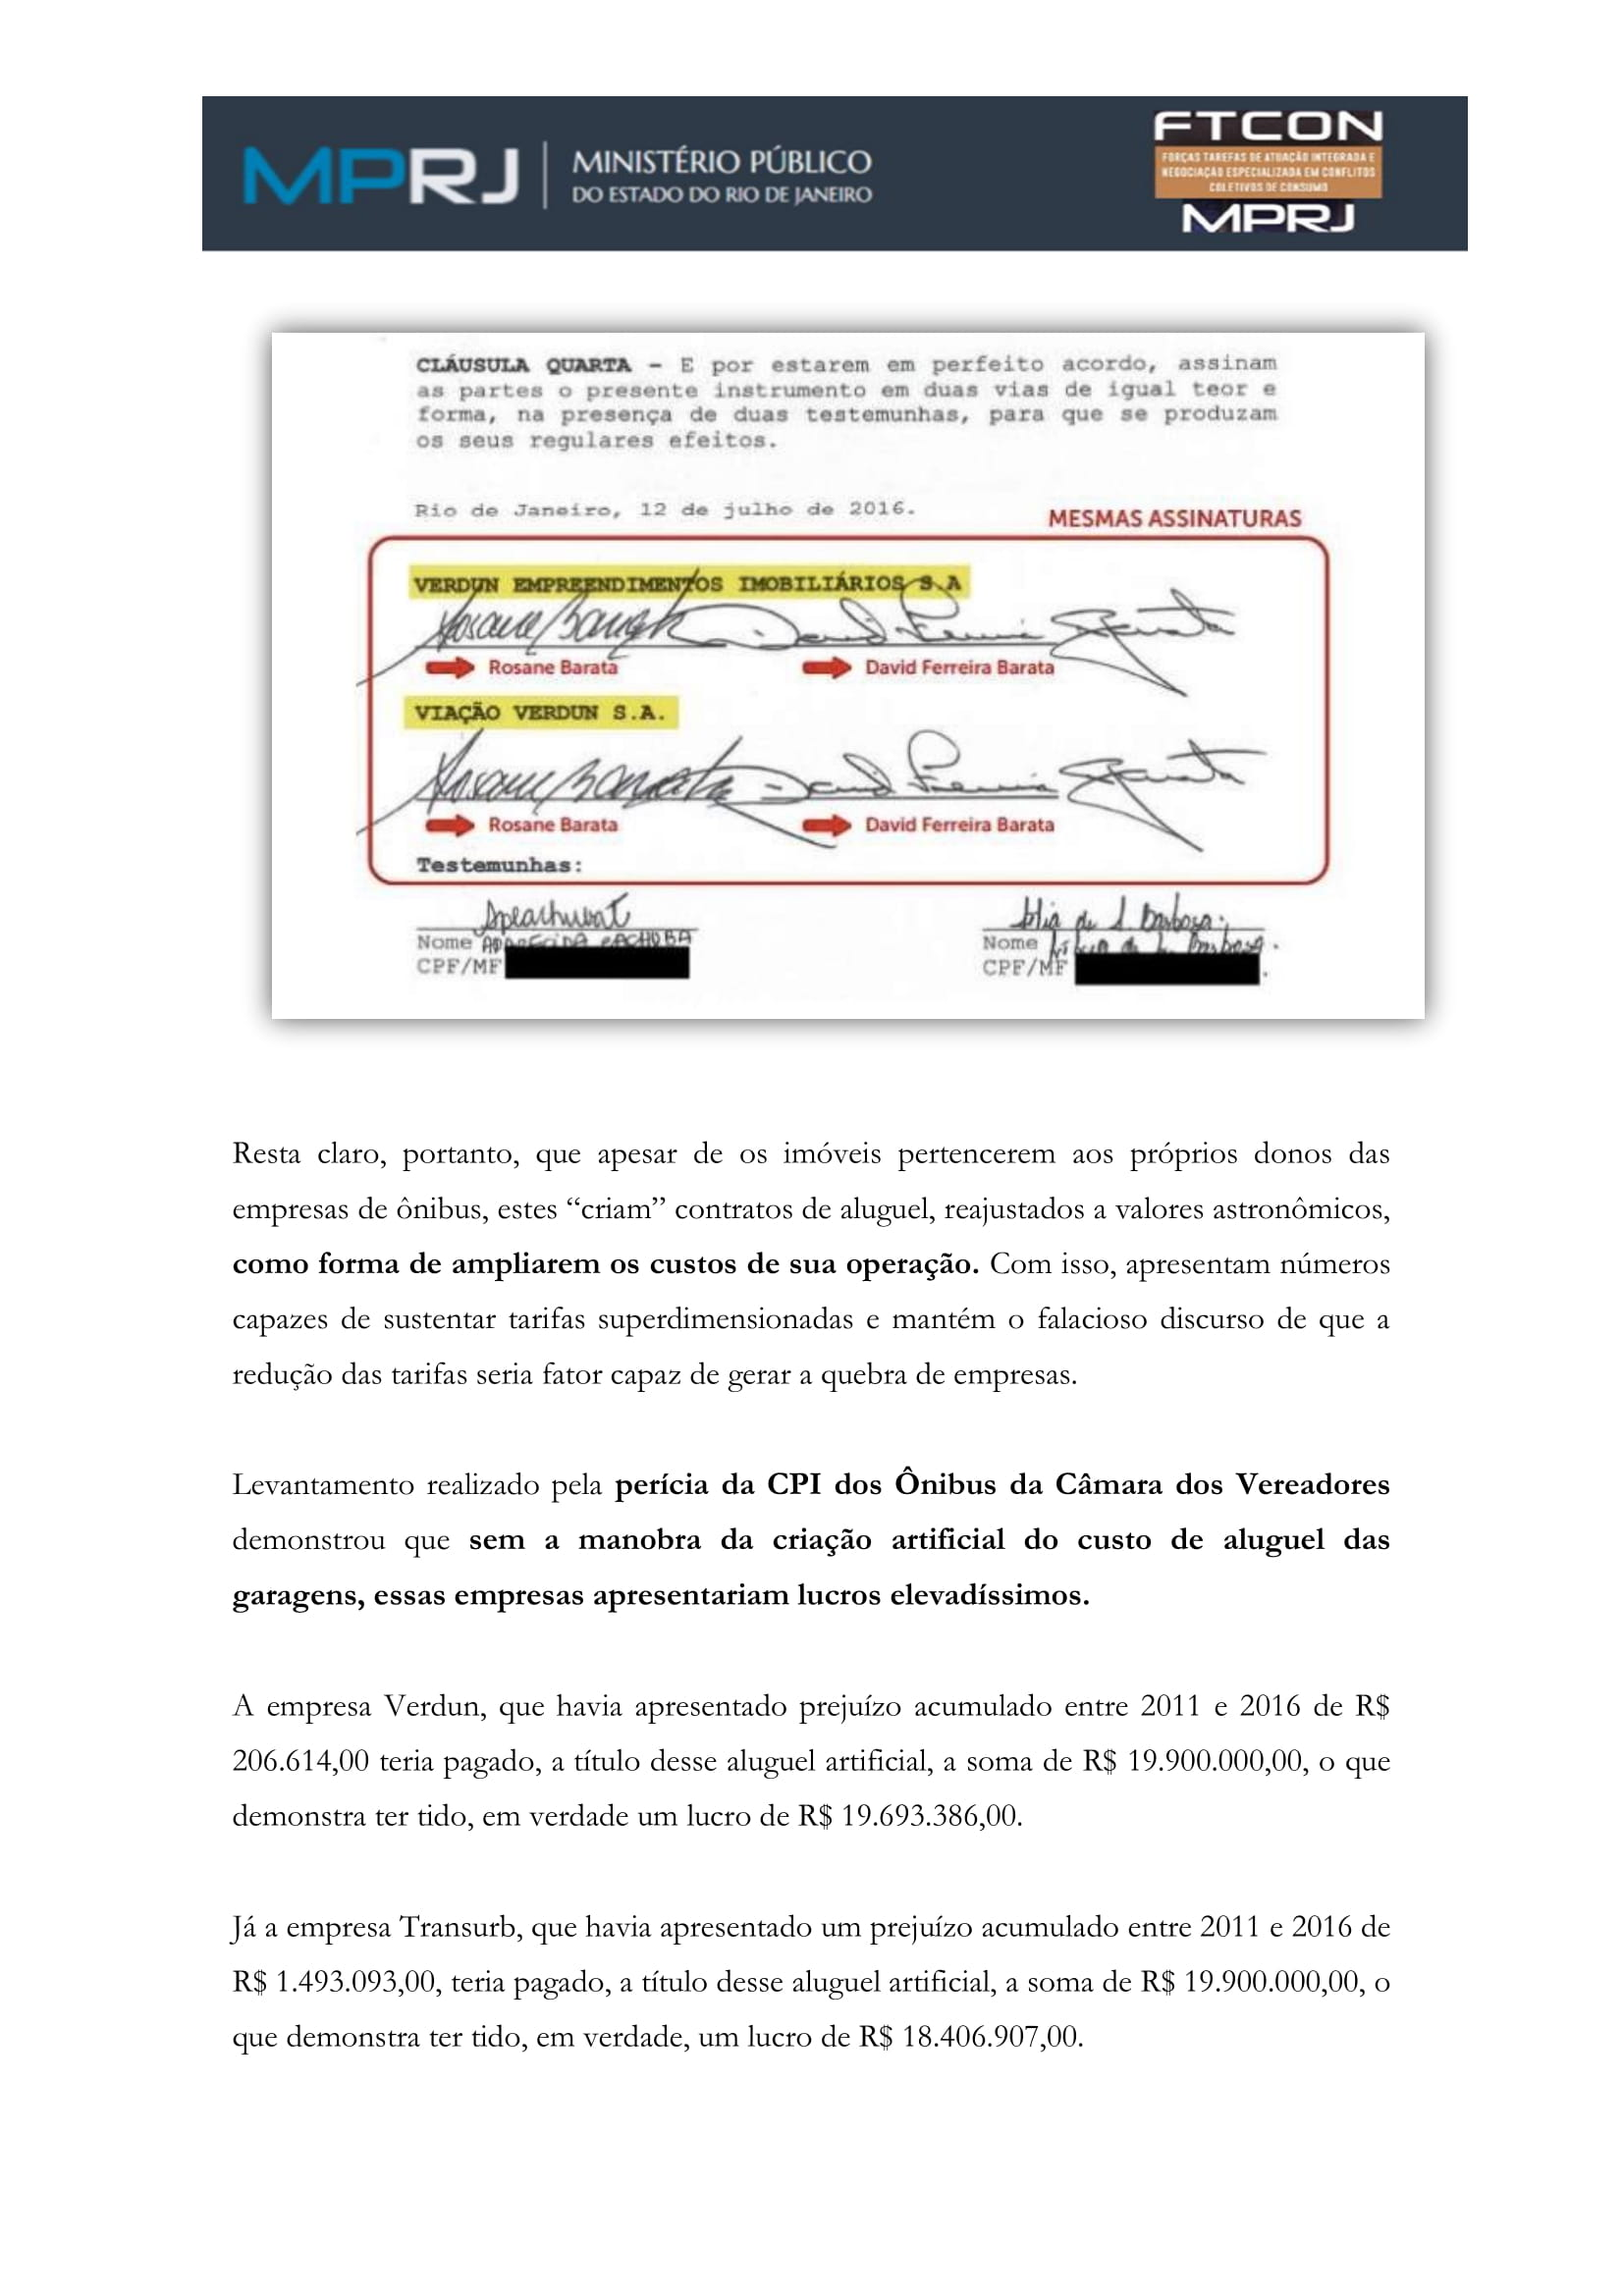 acp_caducidade_onibus_dr_rt-092